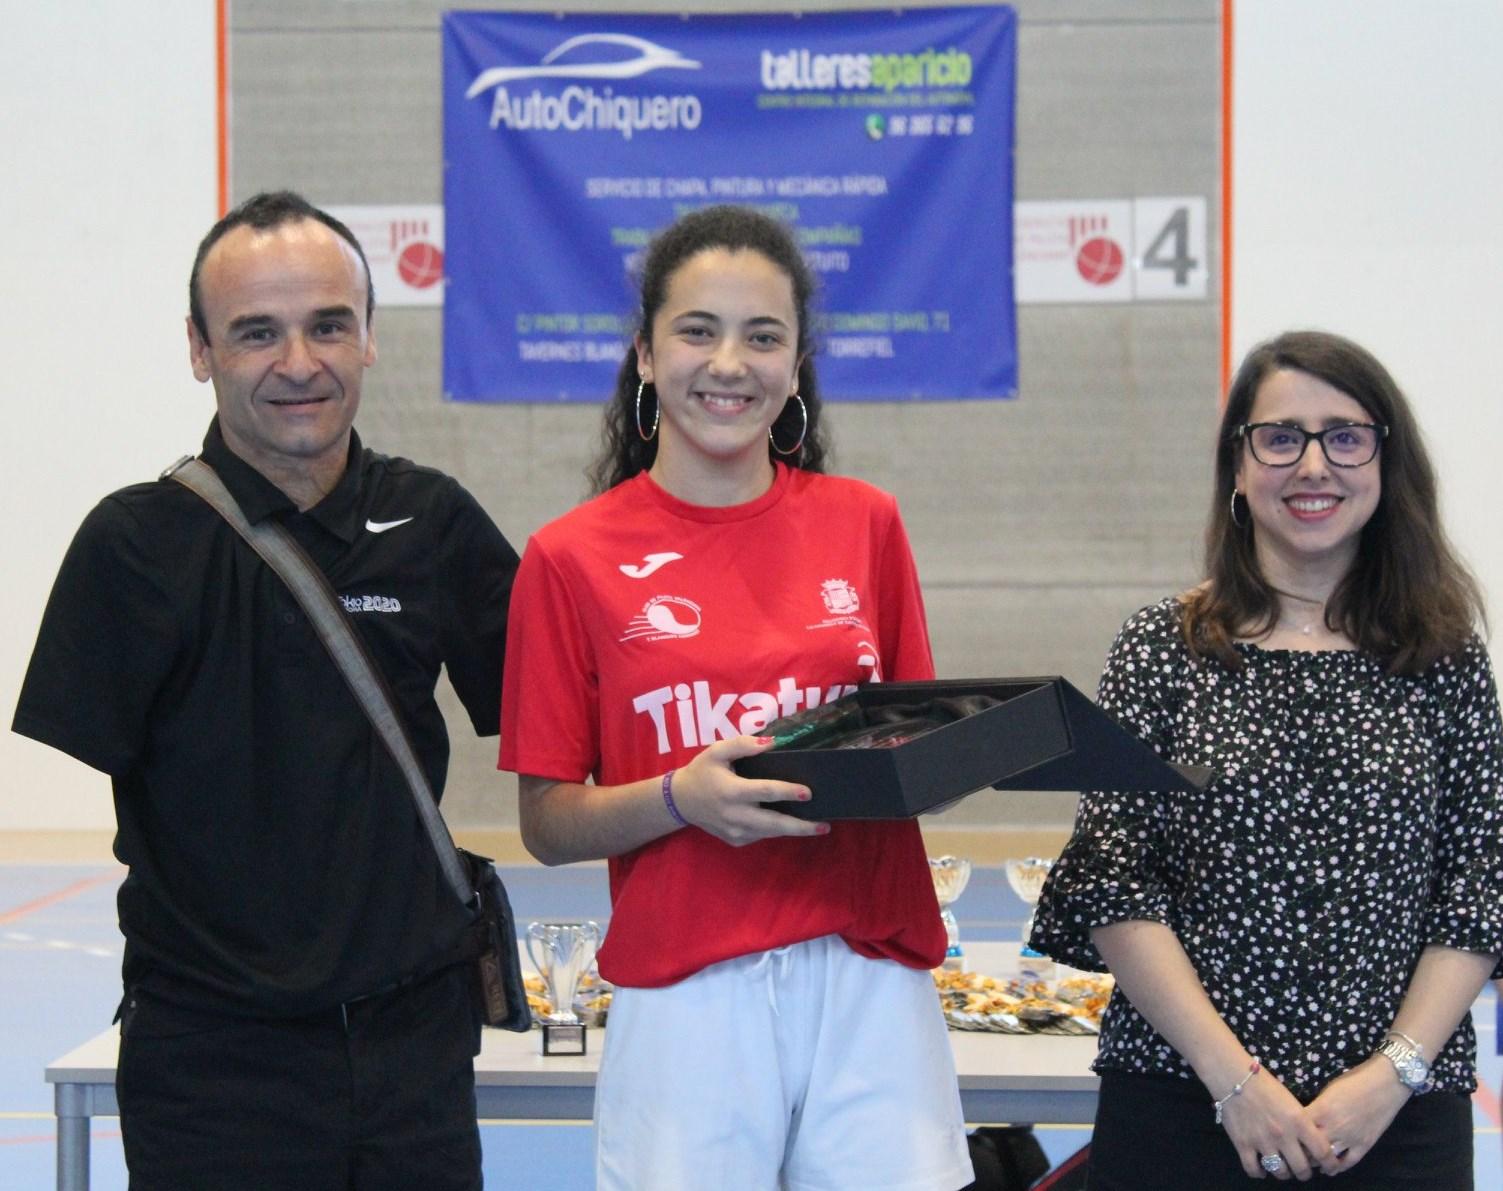 Entrega del Premi Ricardo Ten a l'Esforç Esportiu - Mario Torres Artesania - Valencia